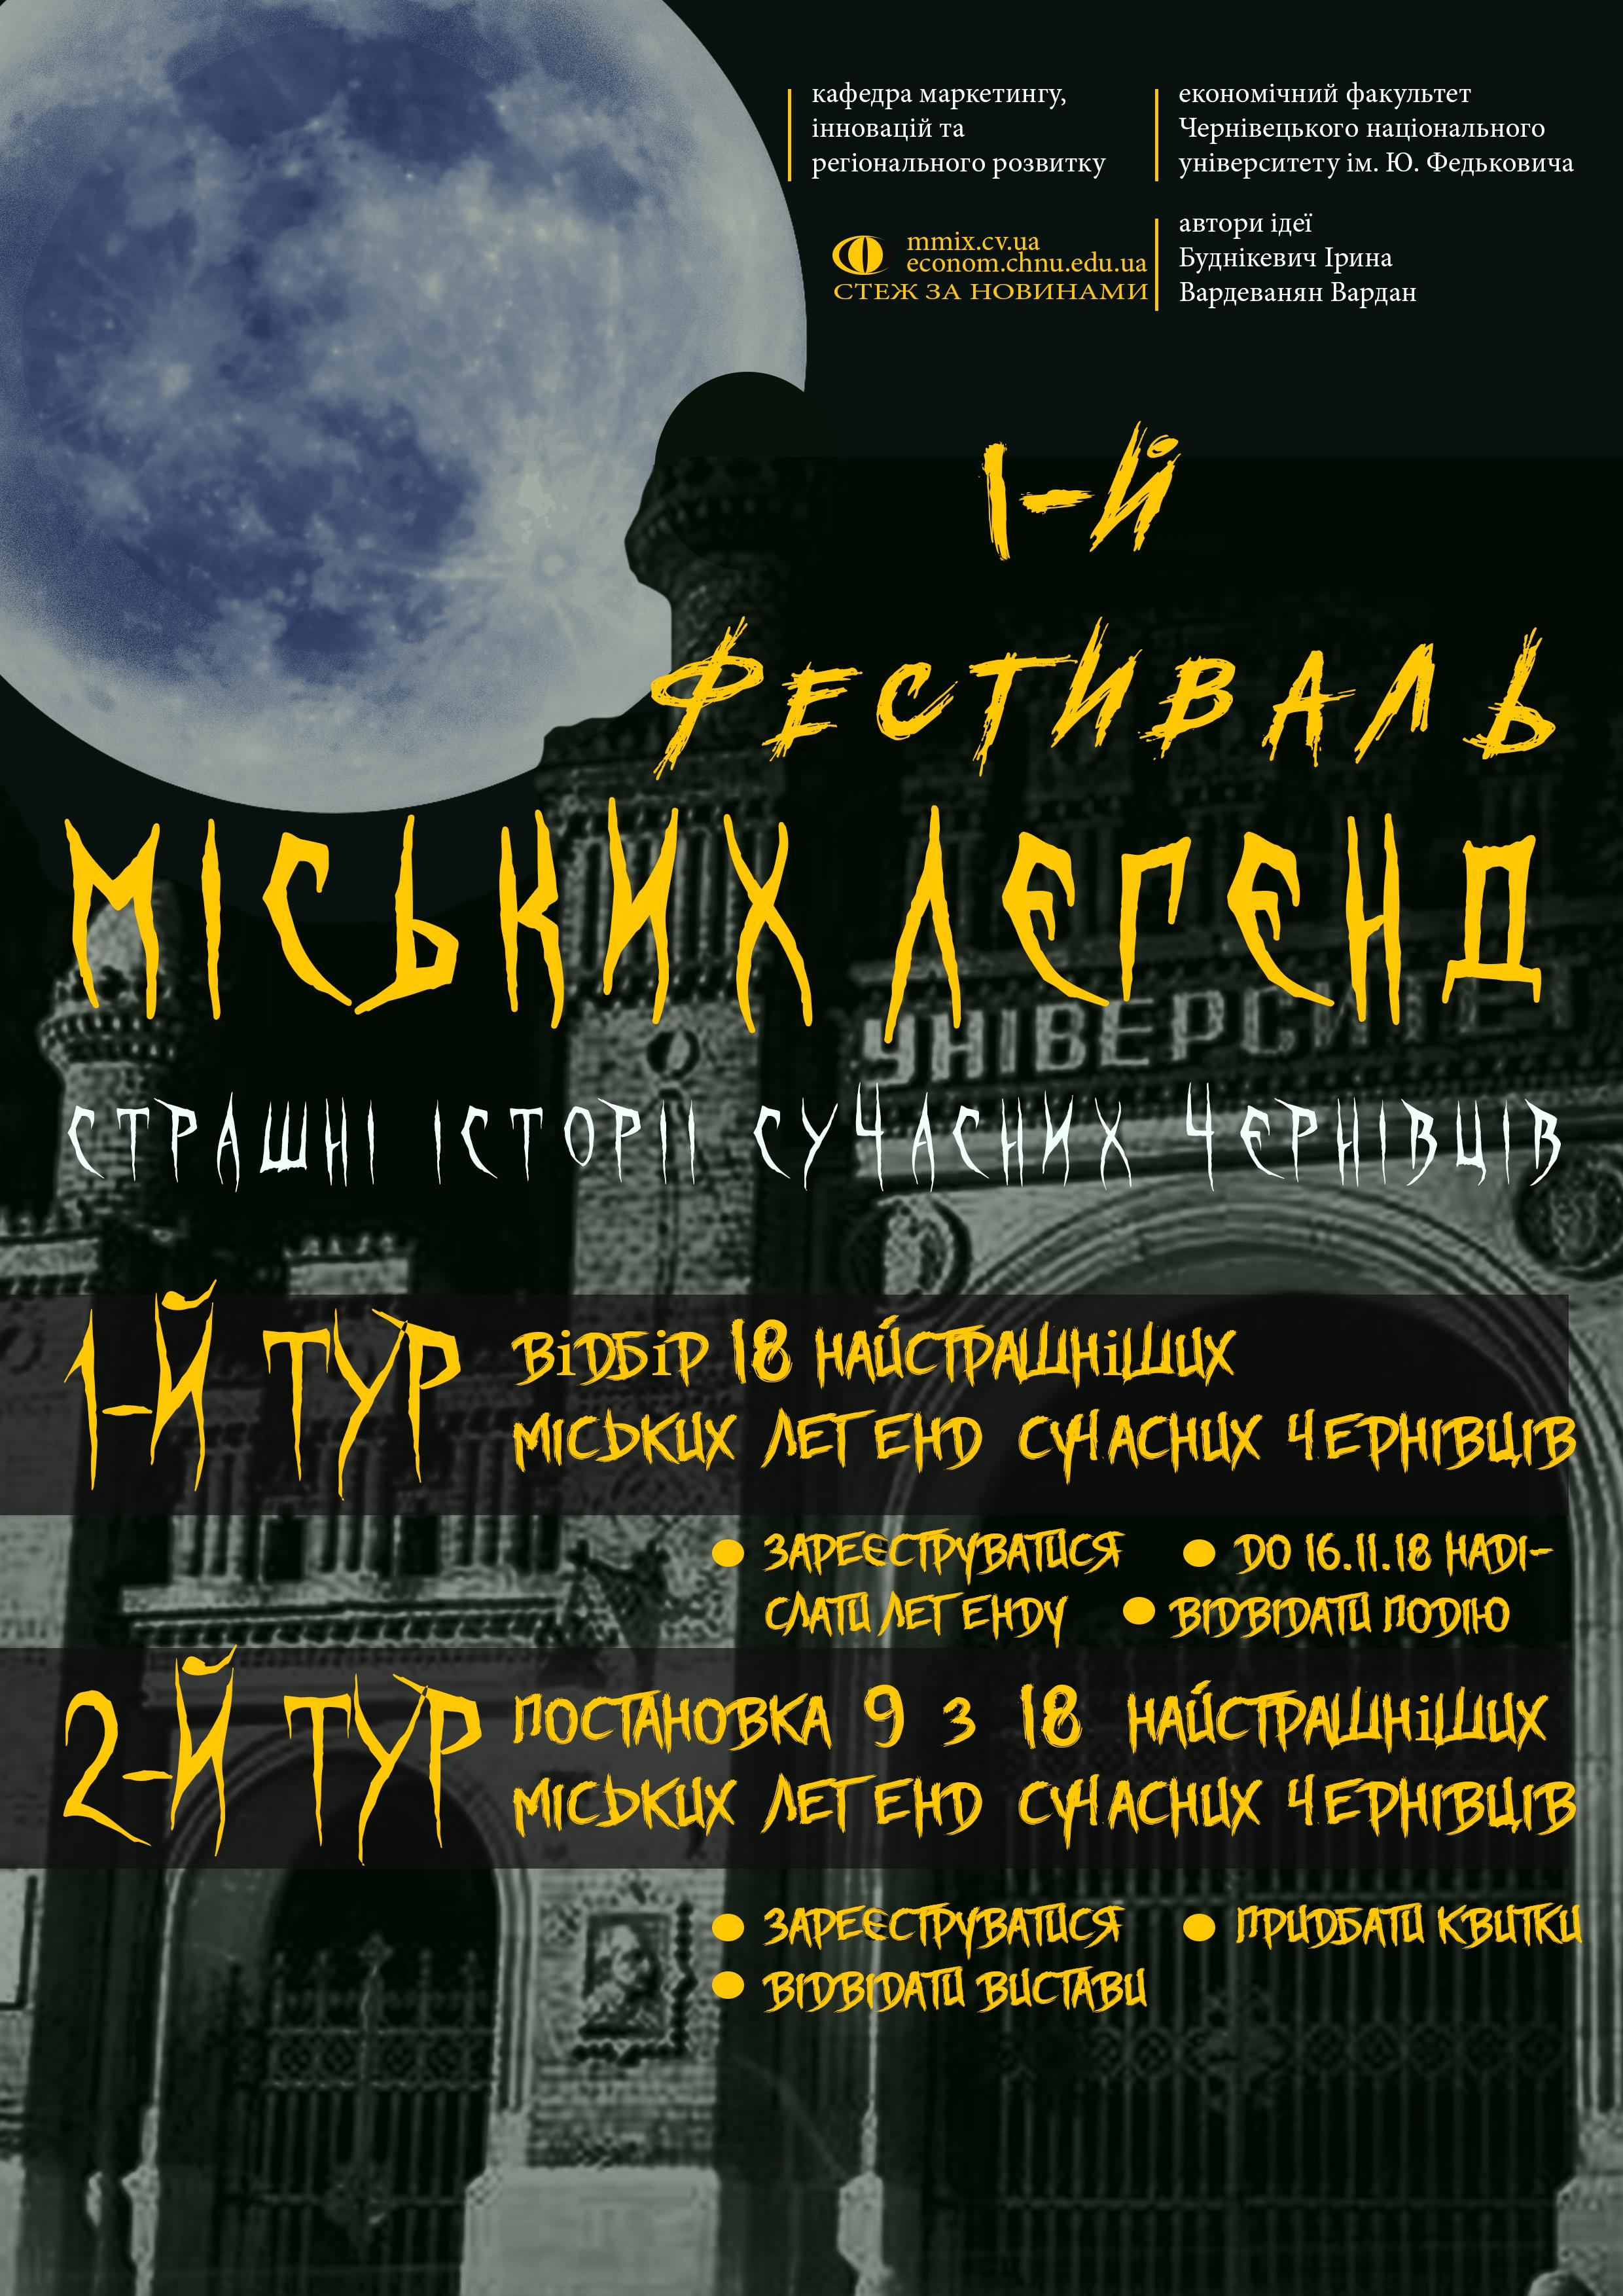 strah_cv_ua_new_3 (2)